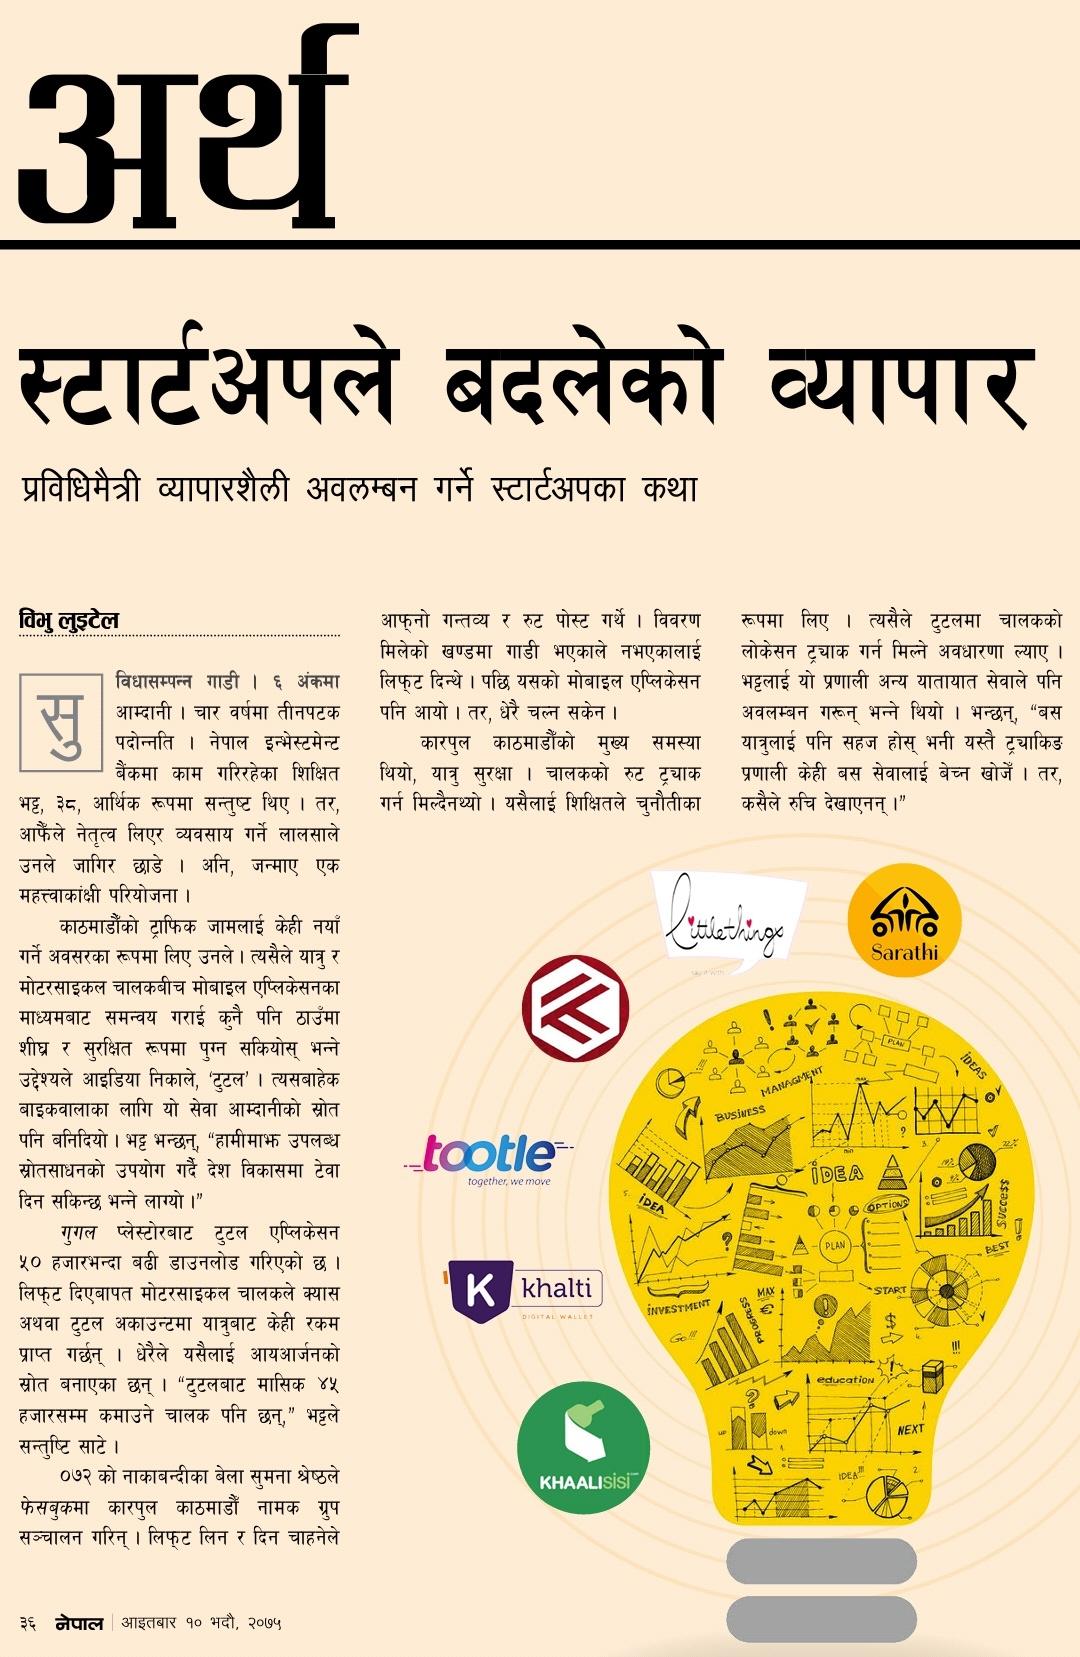 Khalti Digital Wallet_Nepal Magazine Coverage_Page 1